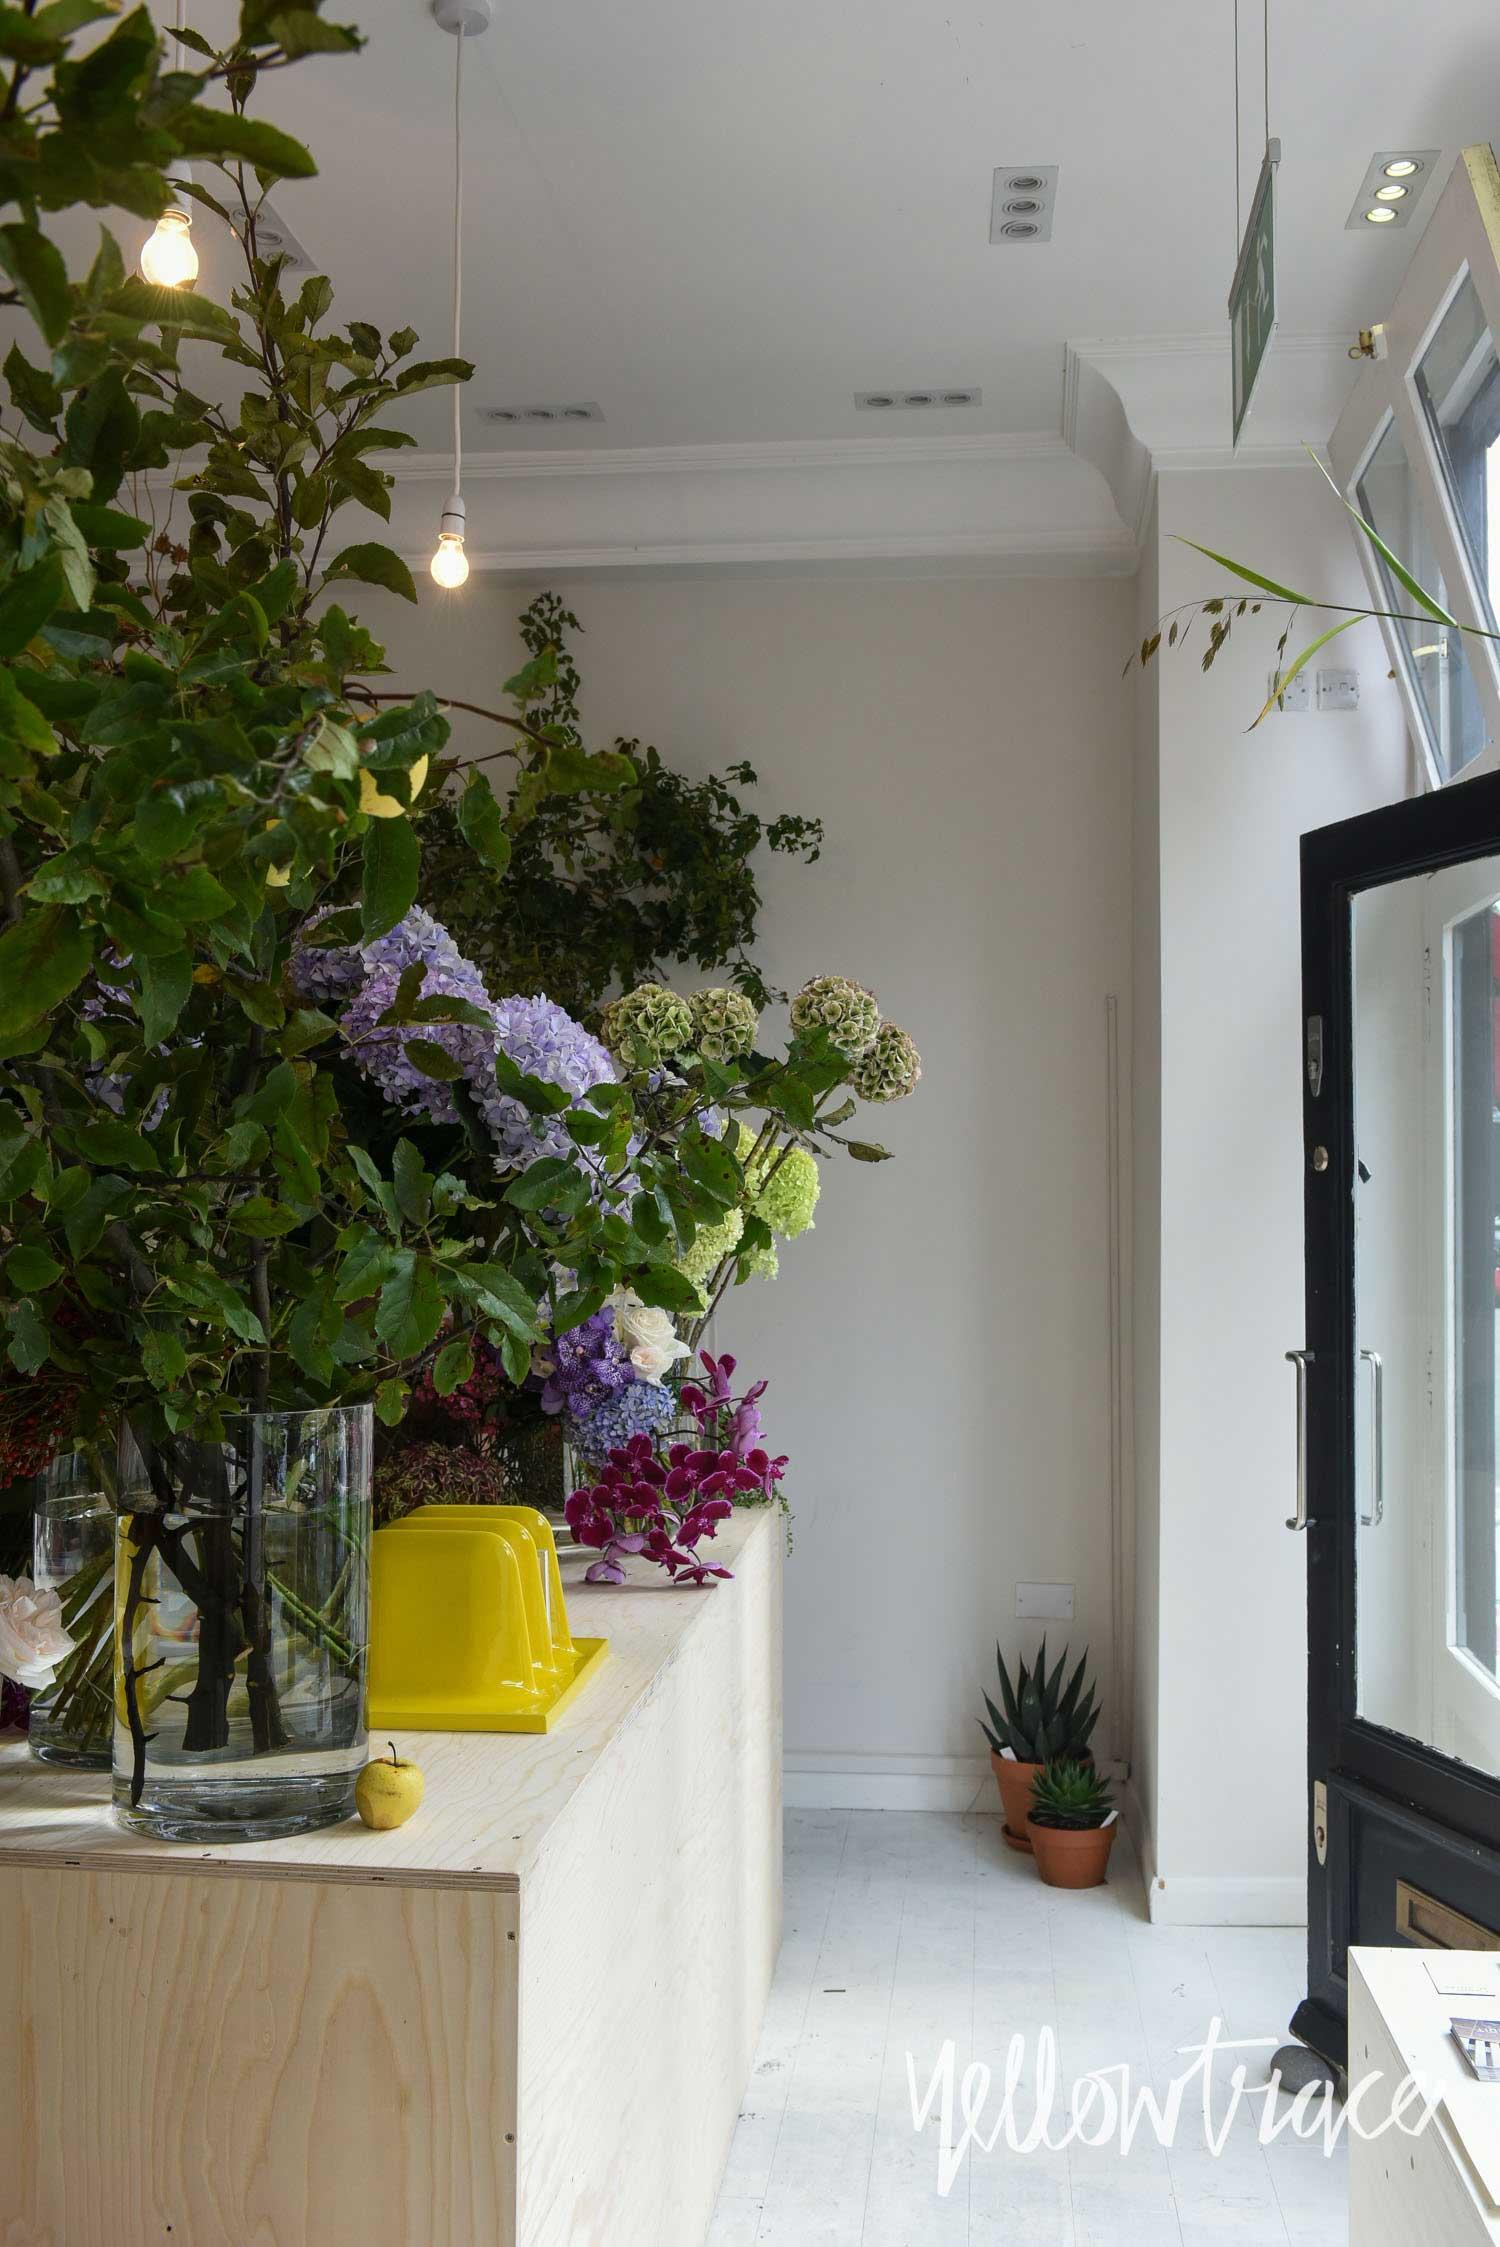 Brompton Design District LDF15, Photo ©Nick Hughes | Yellowtrace